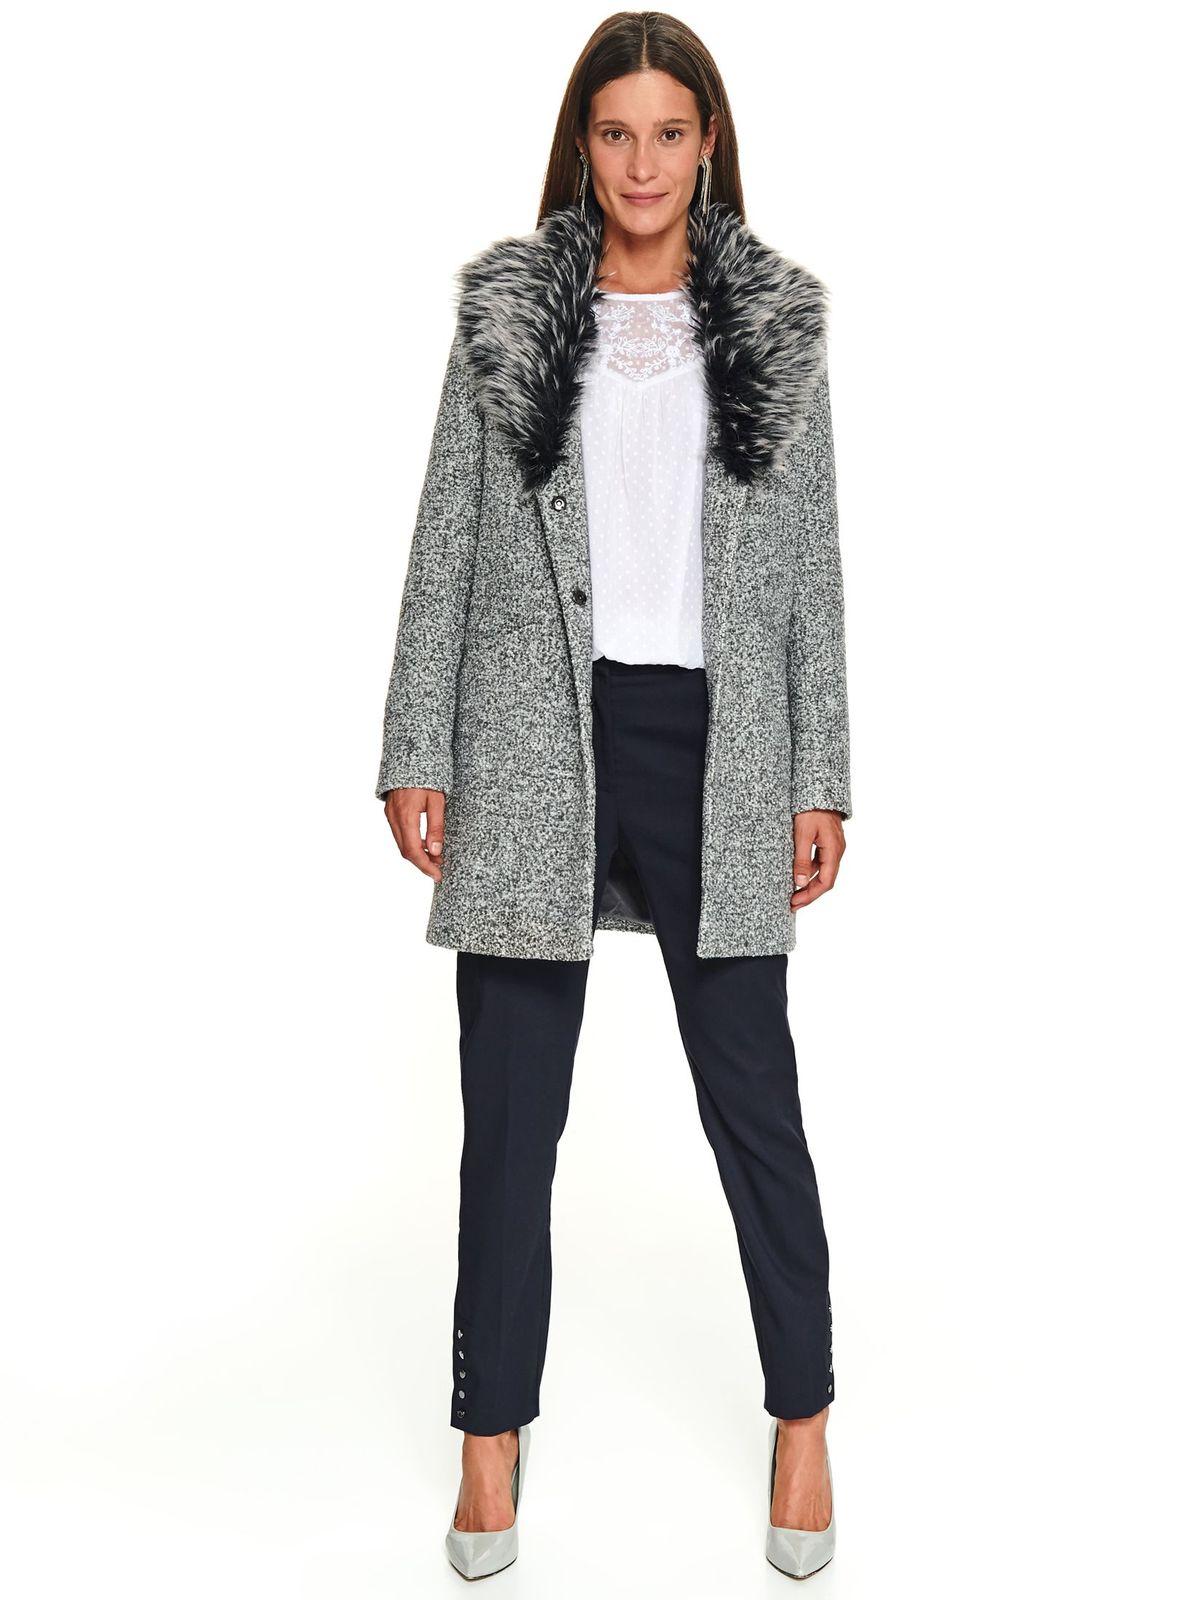 Palton Top Secret piersica casual cu croi larg cu guler din blana ecologica